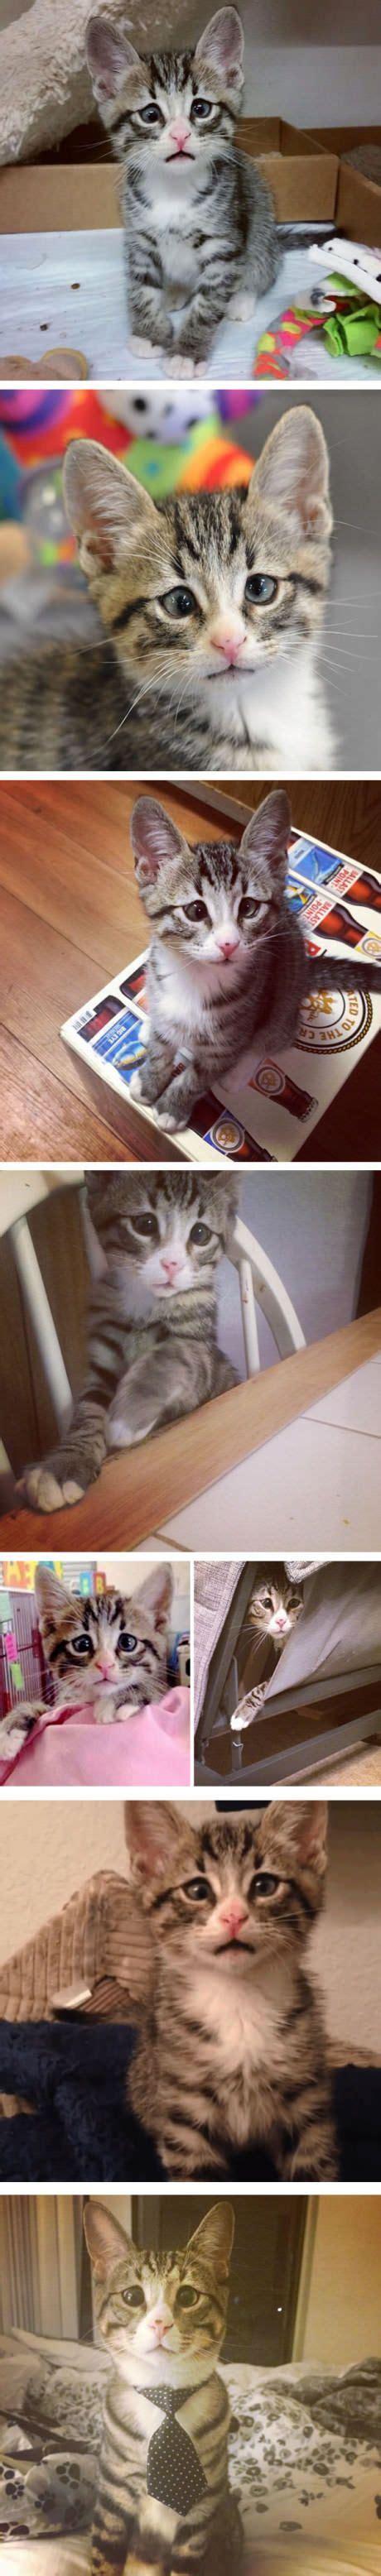 banana kitten named orfey cats best 25 kitten names ideas on cat names